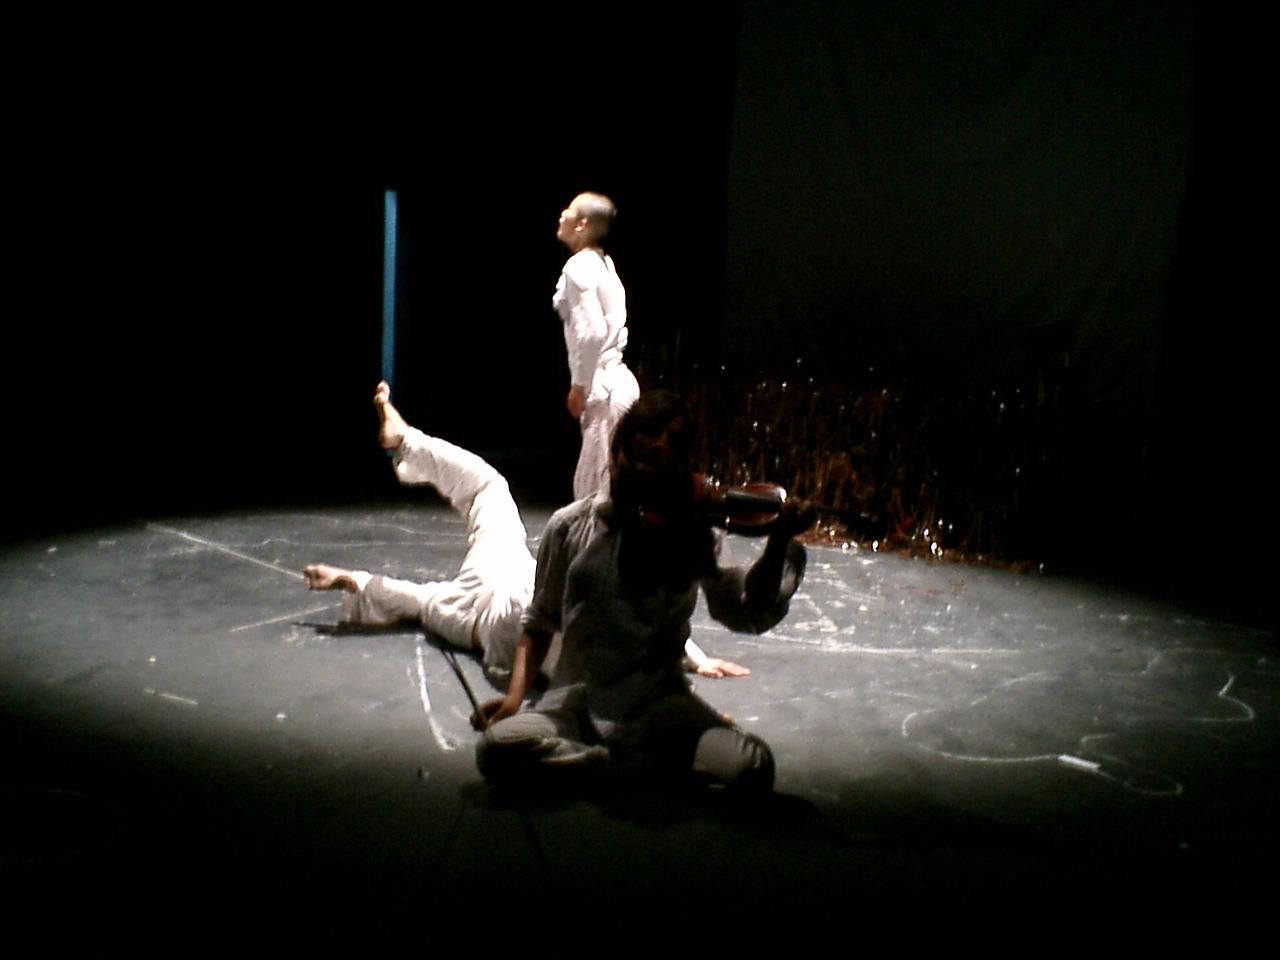 collaboration with director, Arata Kitamura, Manilla, 03'